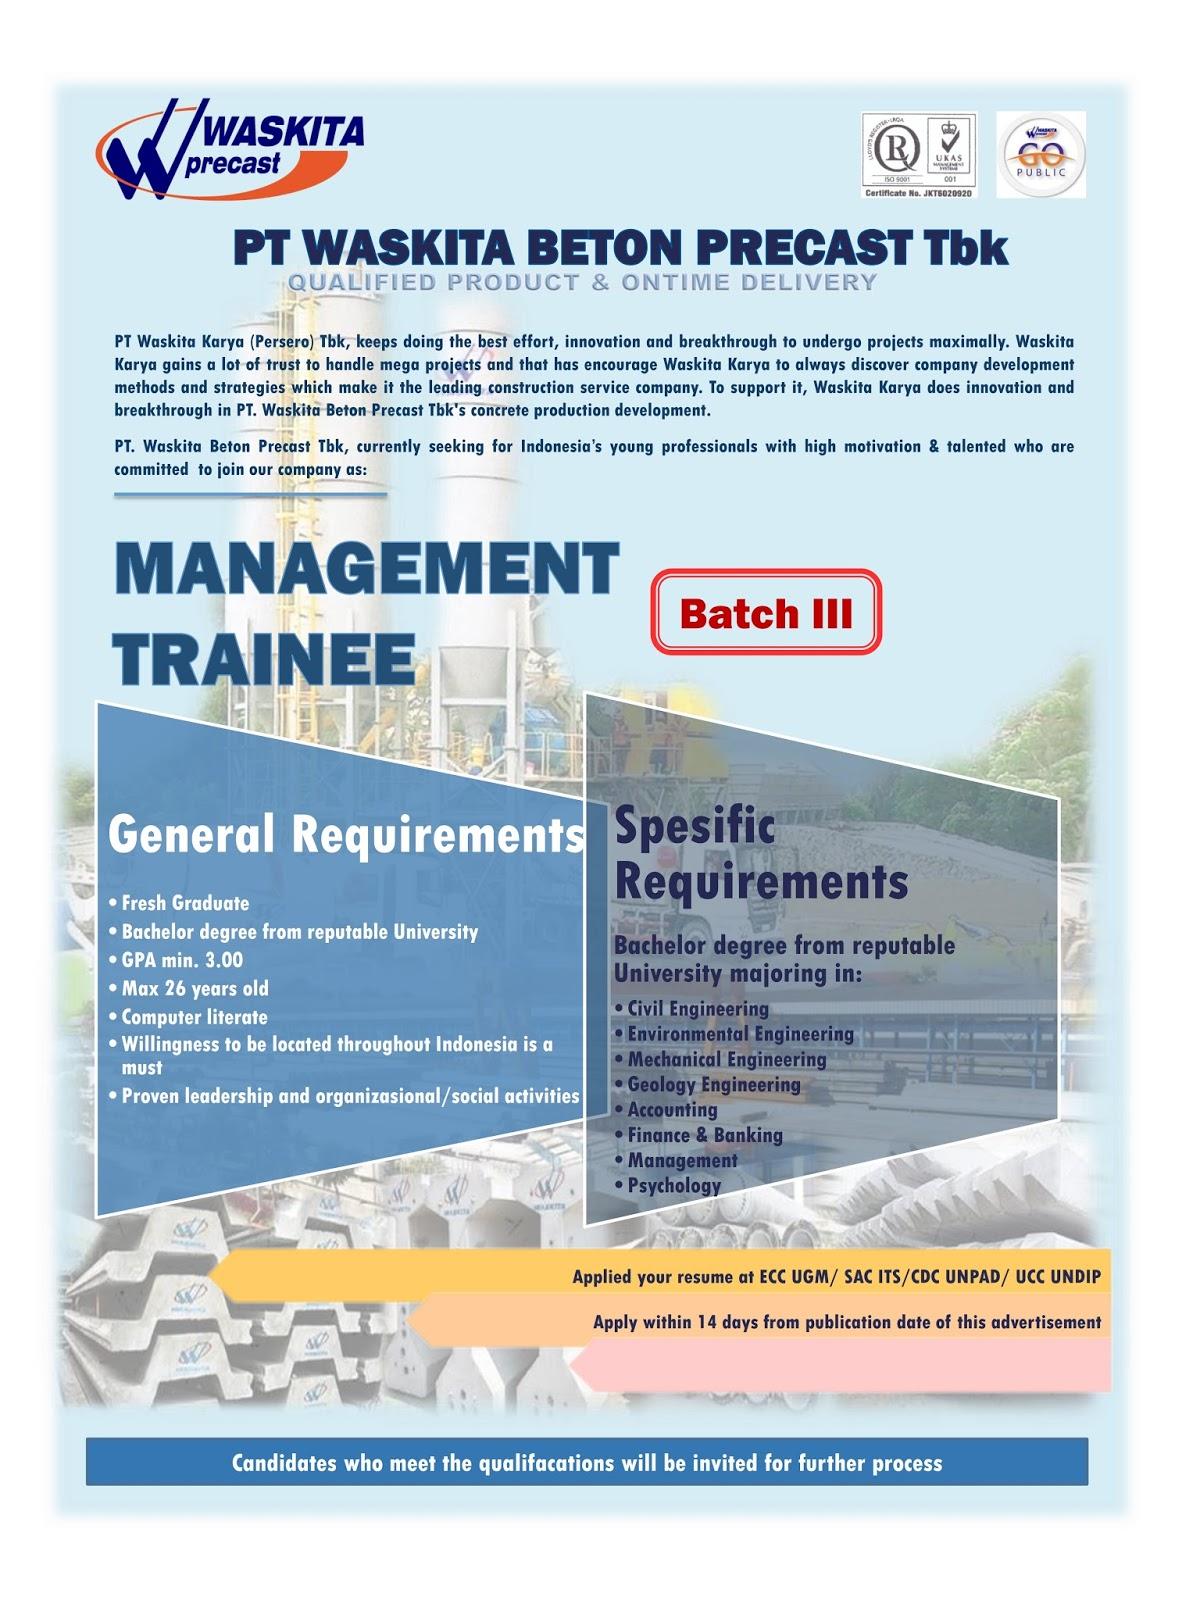 Lowongan Fresh Graduate PT Waskita Beton Precast Batch III